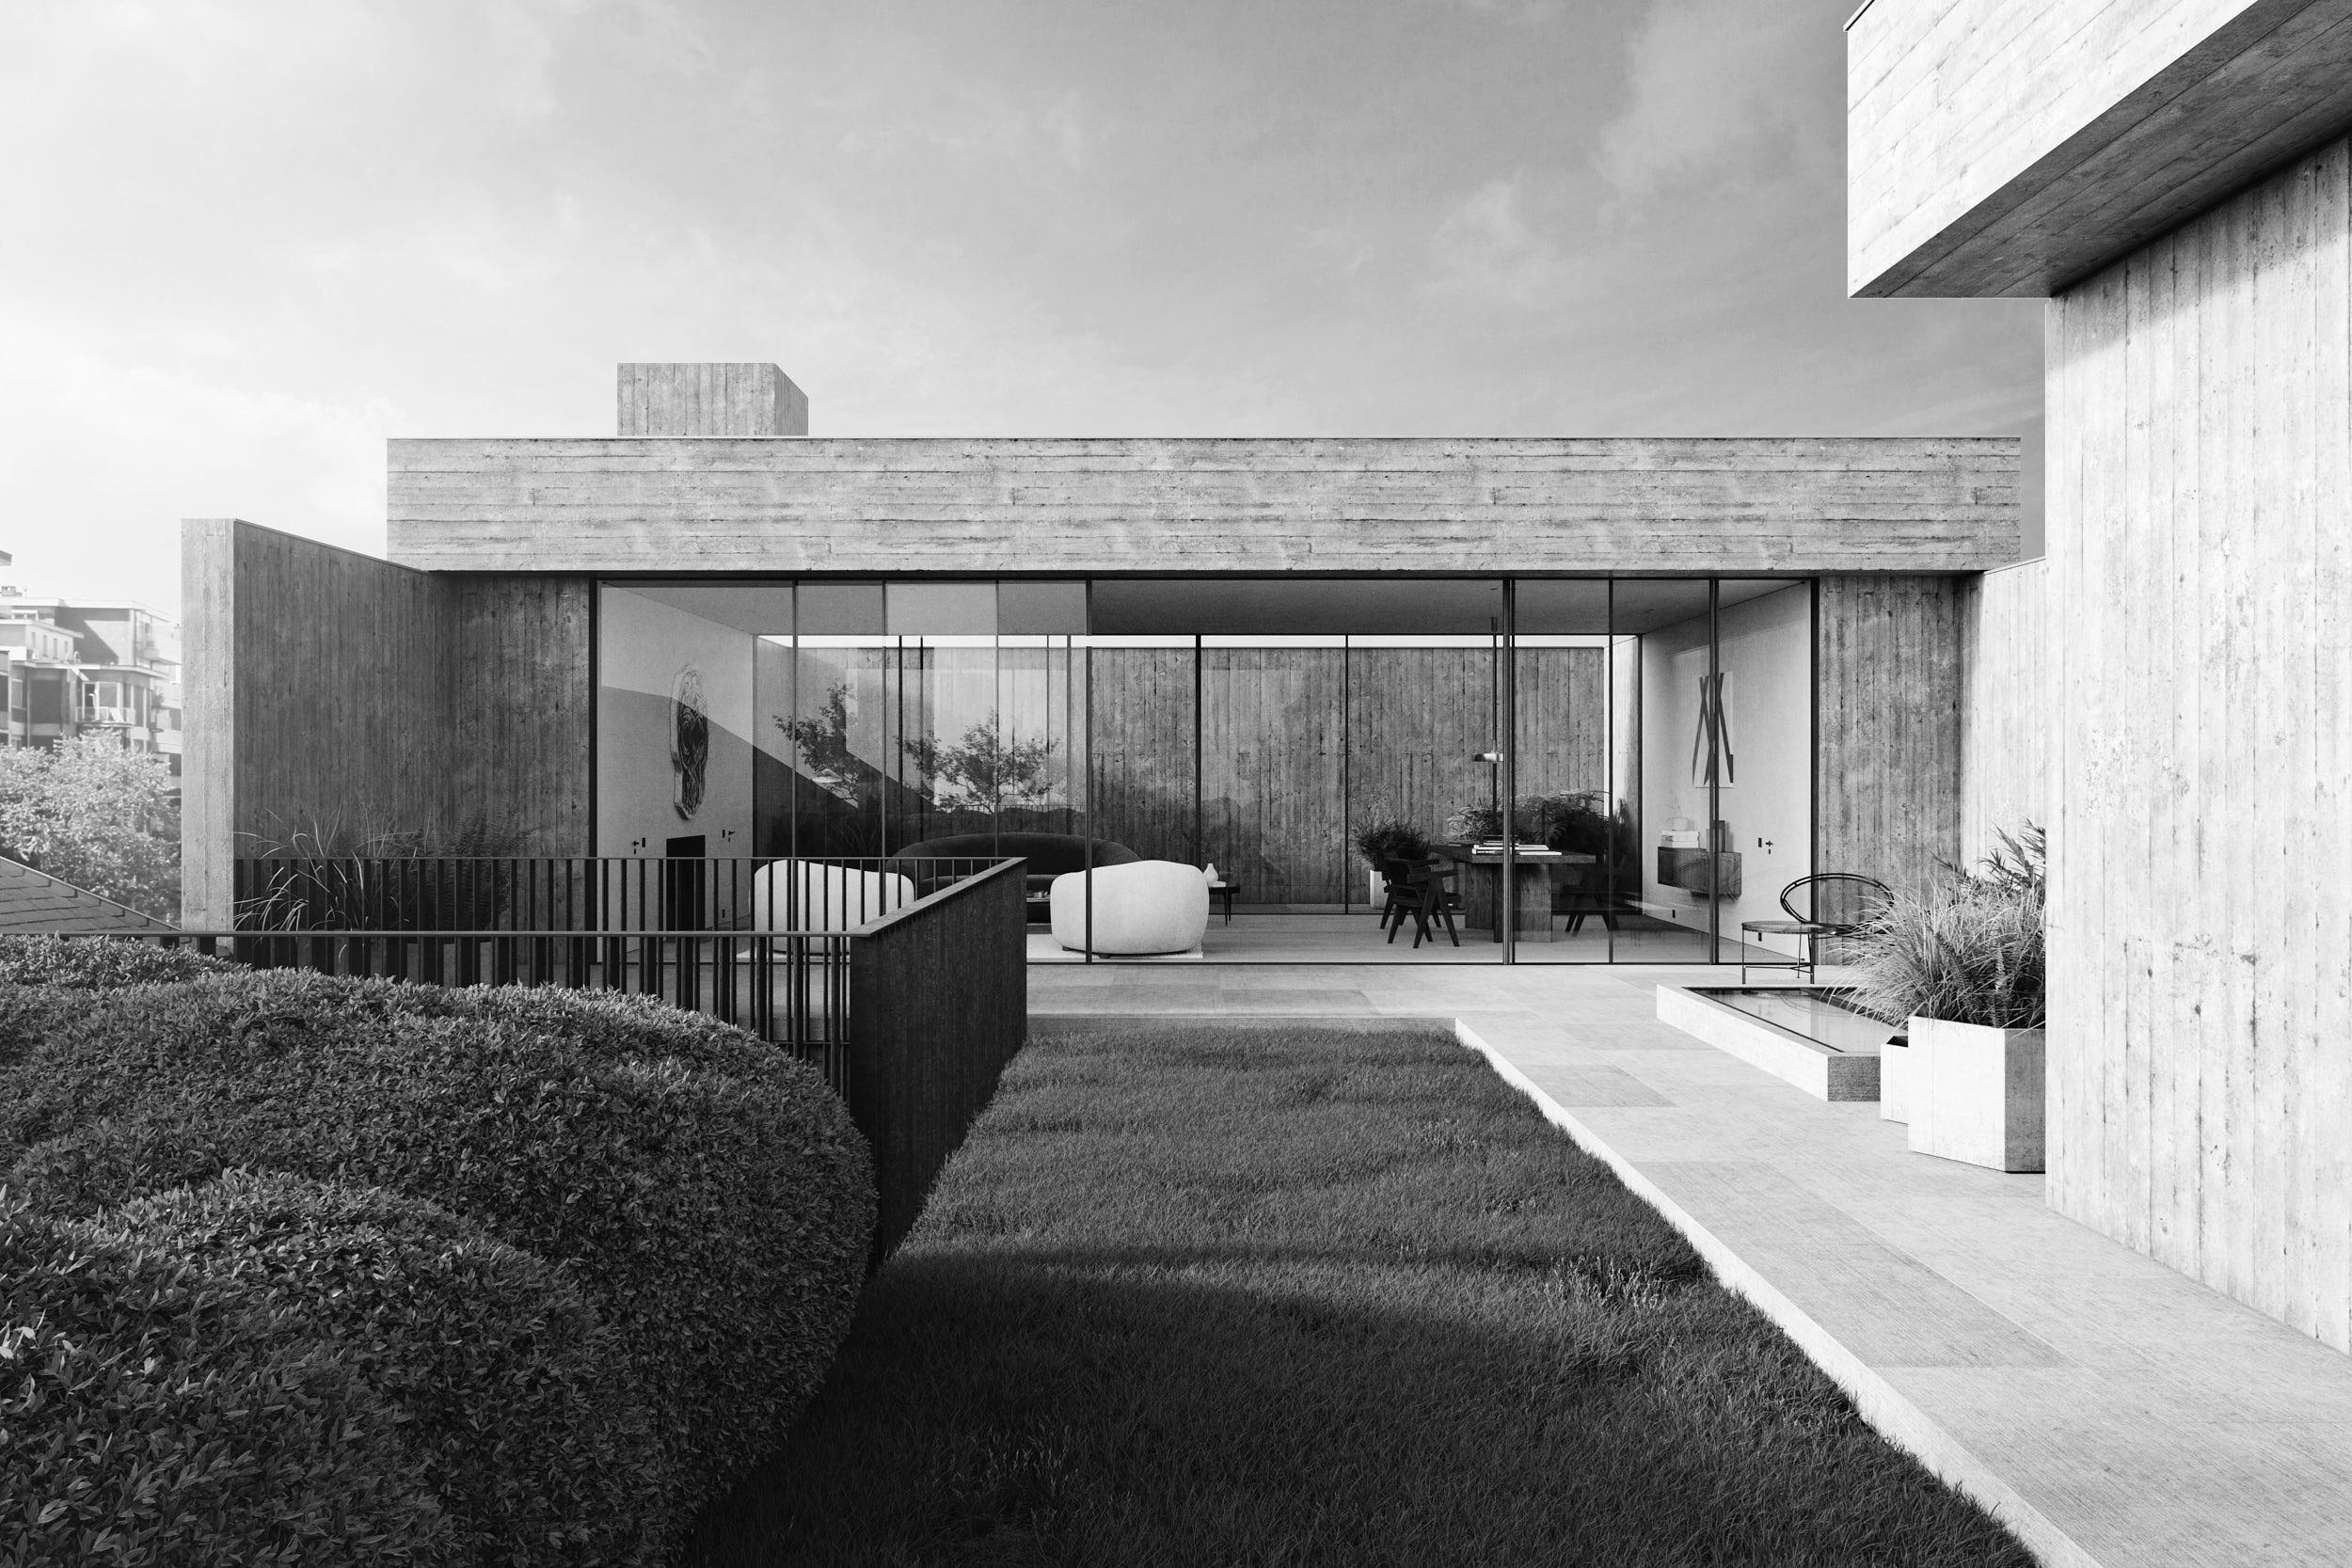 WV-OR Penthouse by Nicolas Schuybroek — Image by Claessens & Deschamps